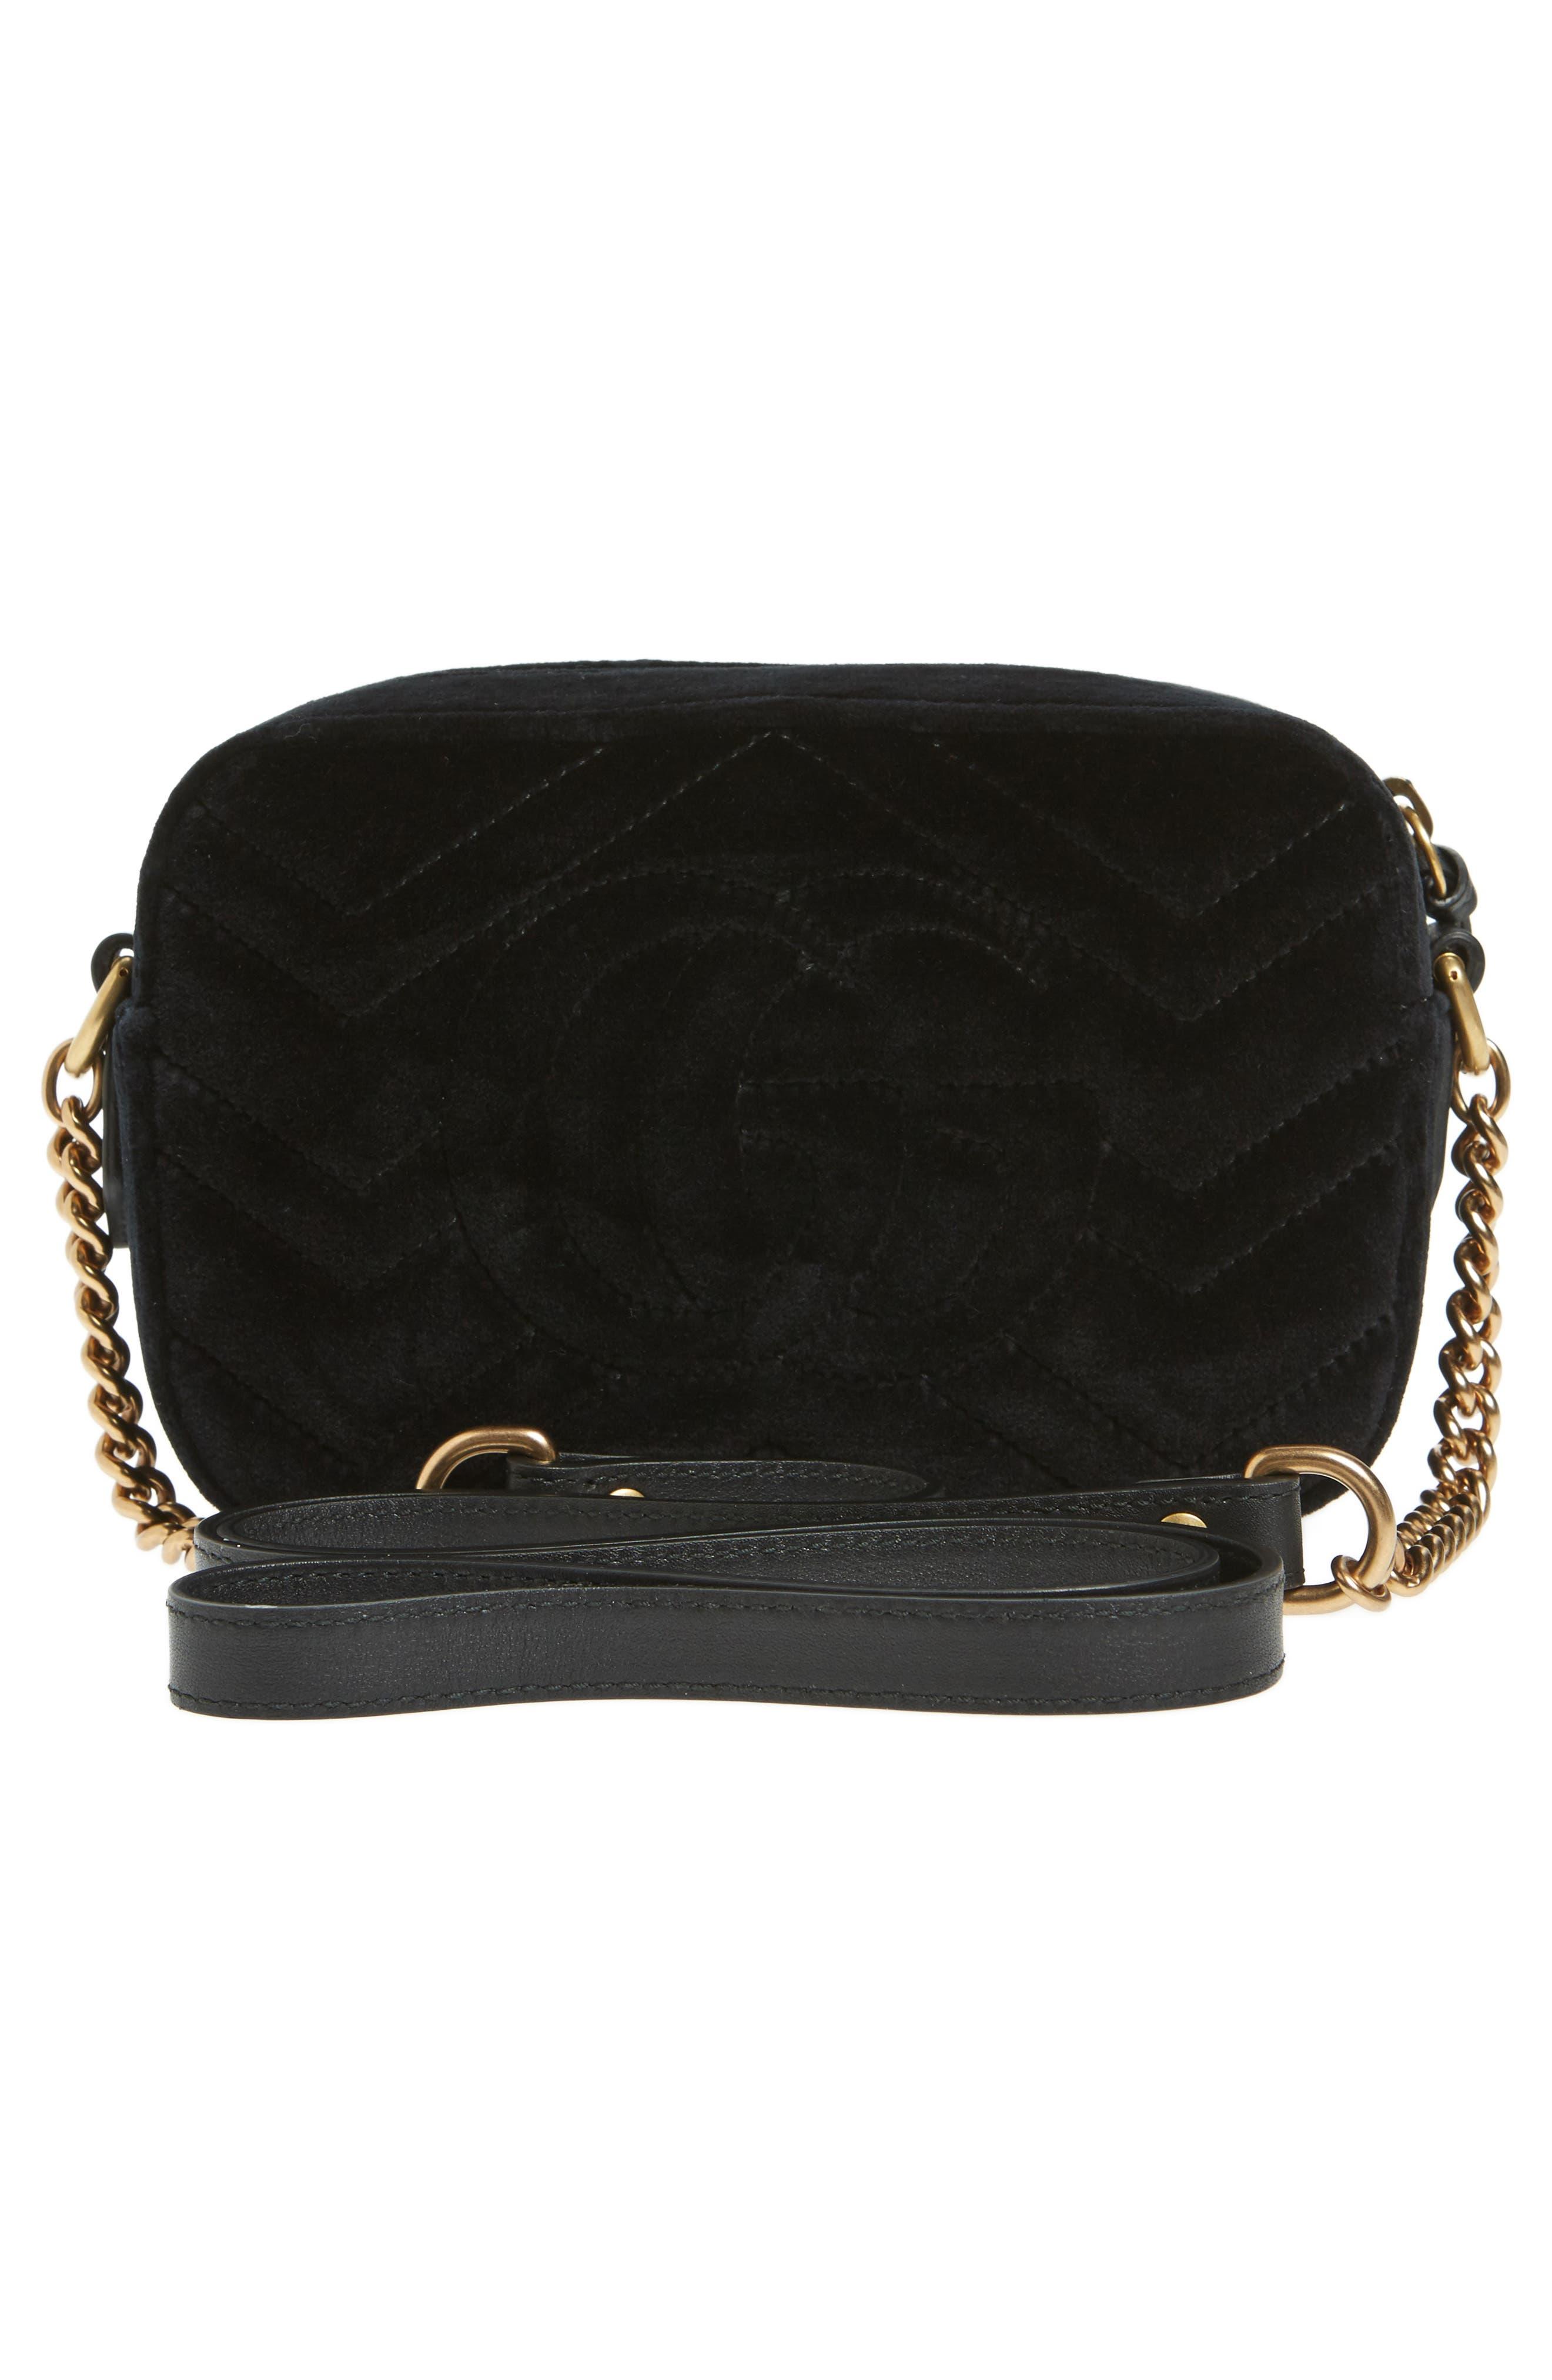 GG Marmont Crystal Matelassé Quilted Velvet Crossbody Bag,                             Alternate thumbnail 3, color,                             001